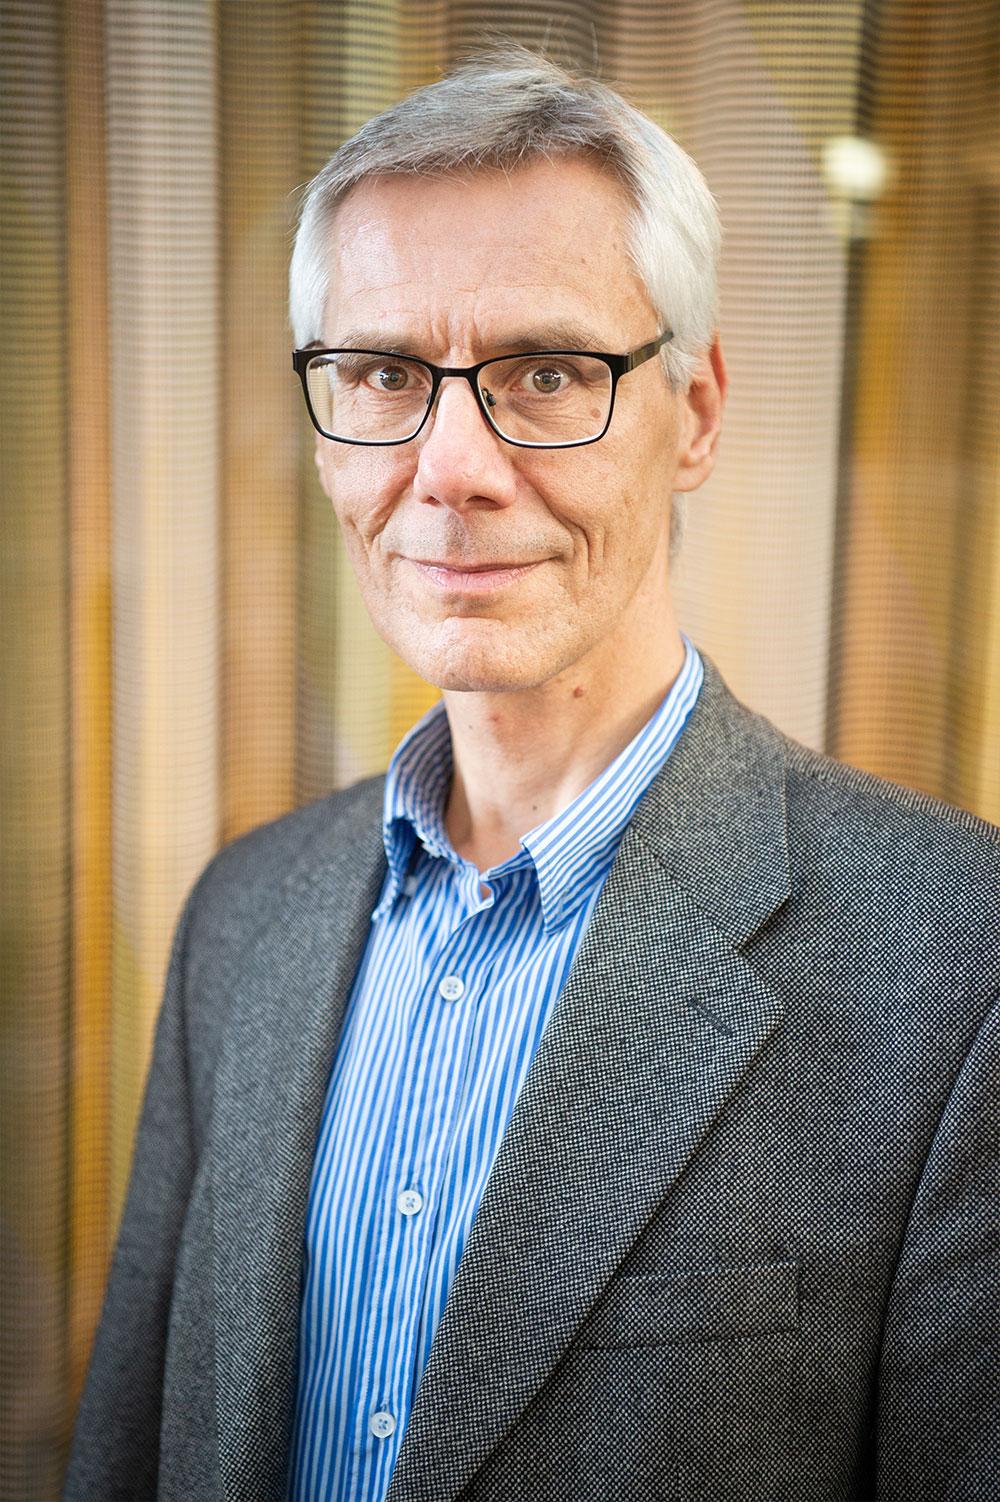 David-Storek--Chalmers-Ventures